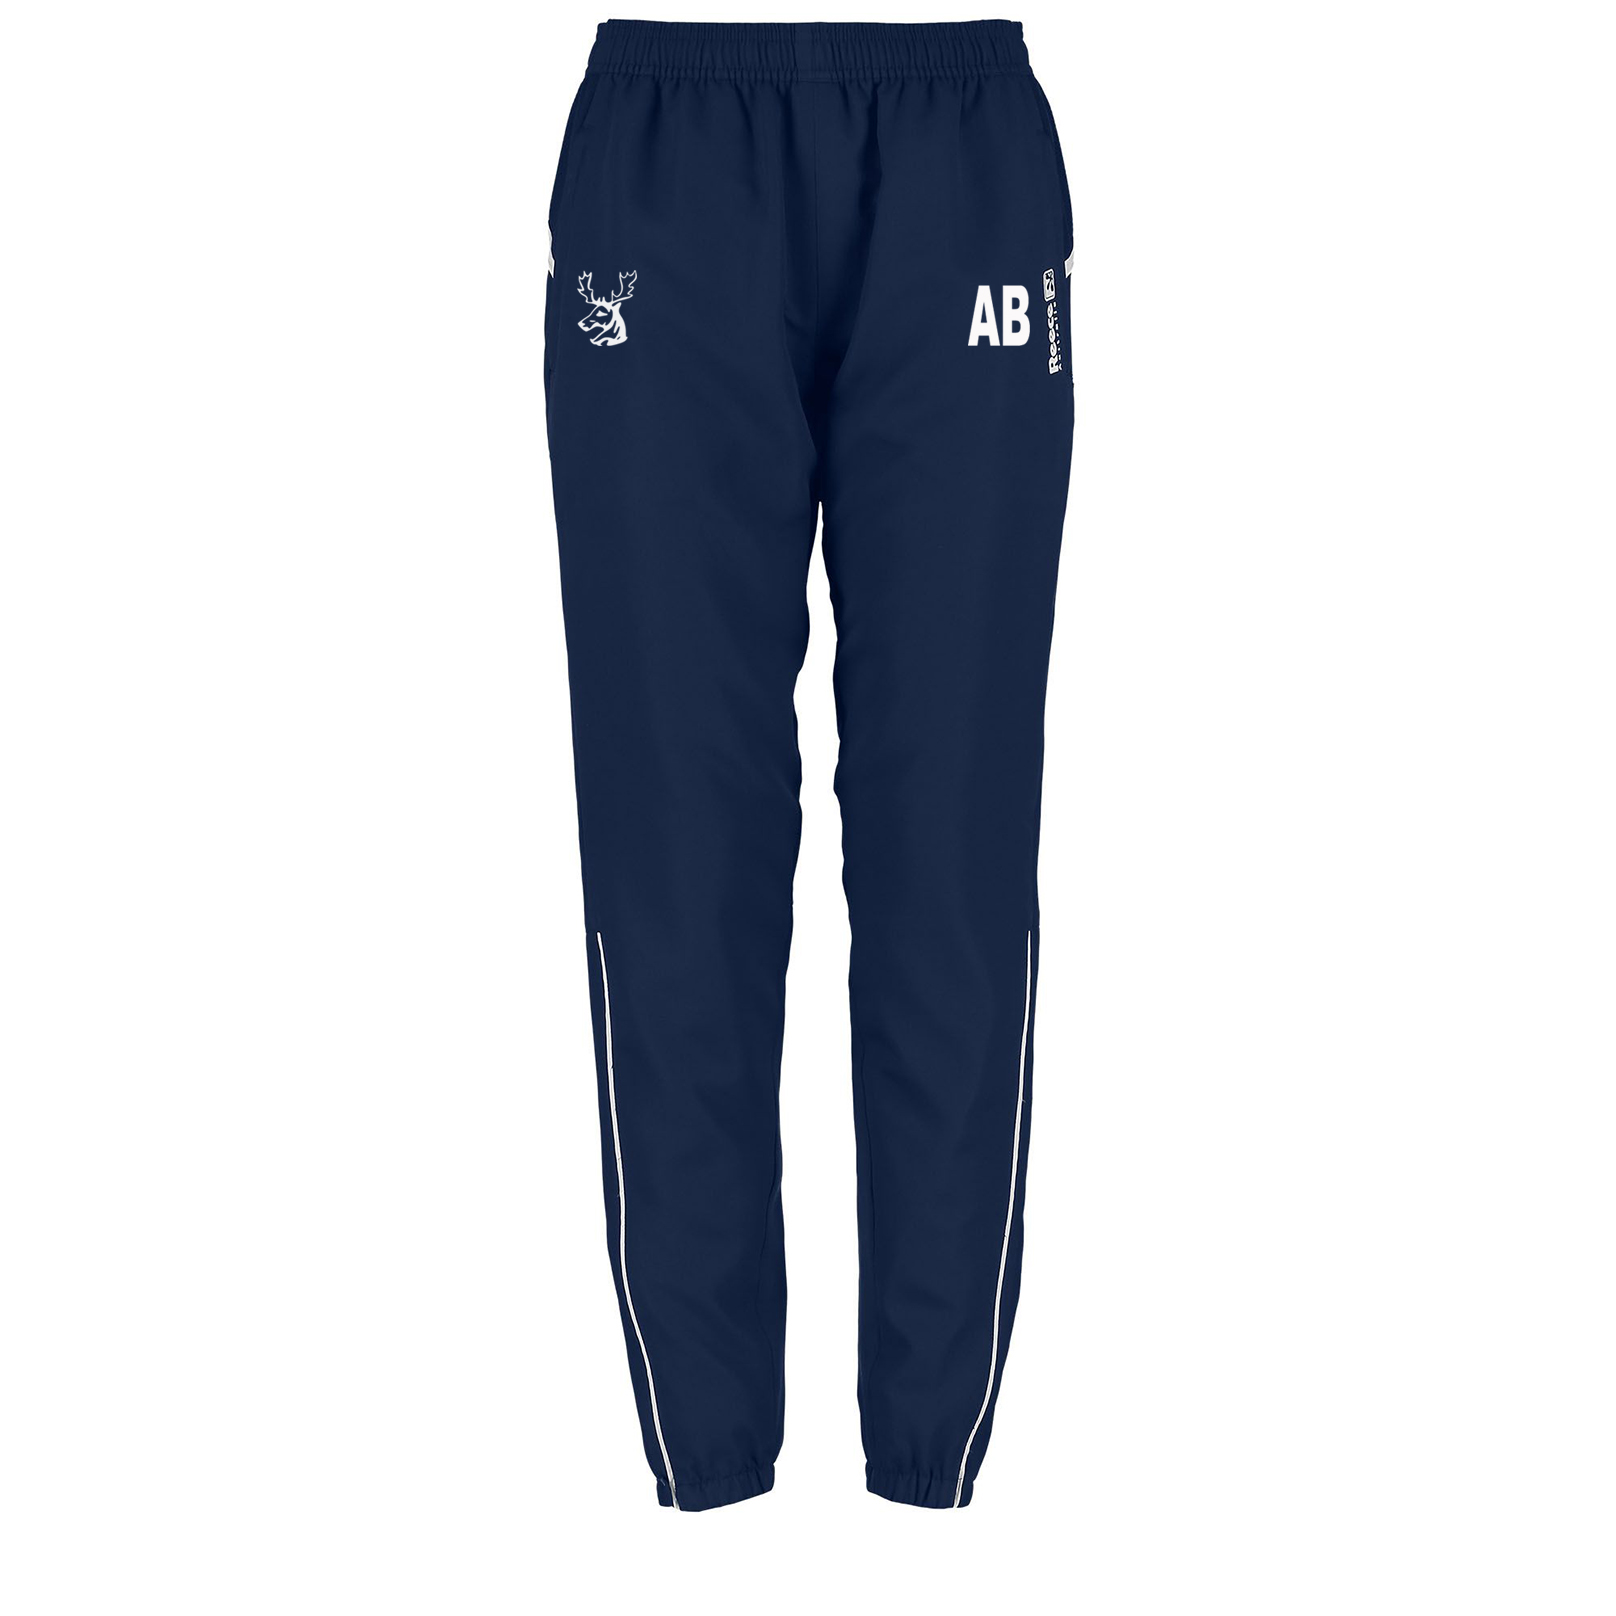 pants-ladies-navy-initials